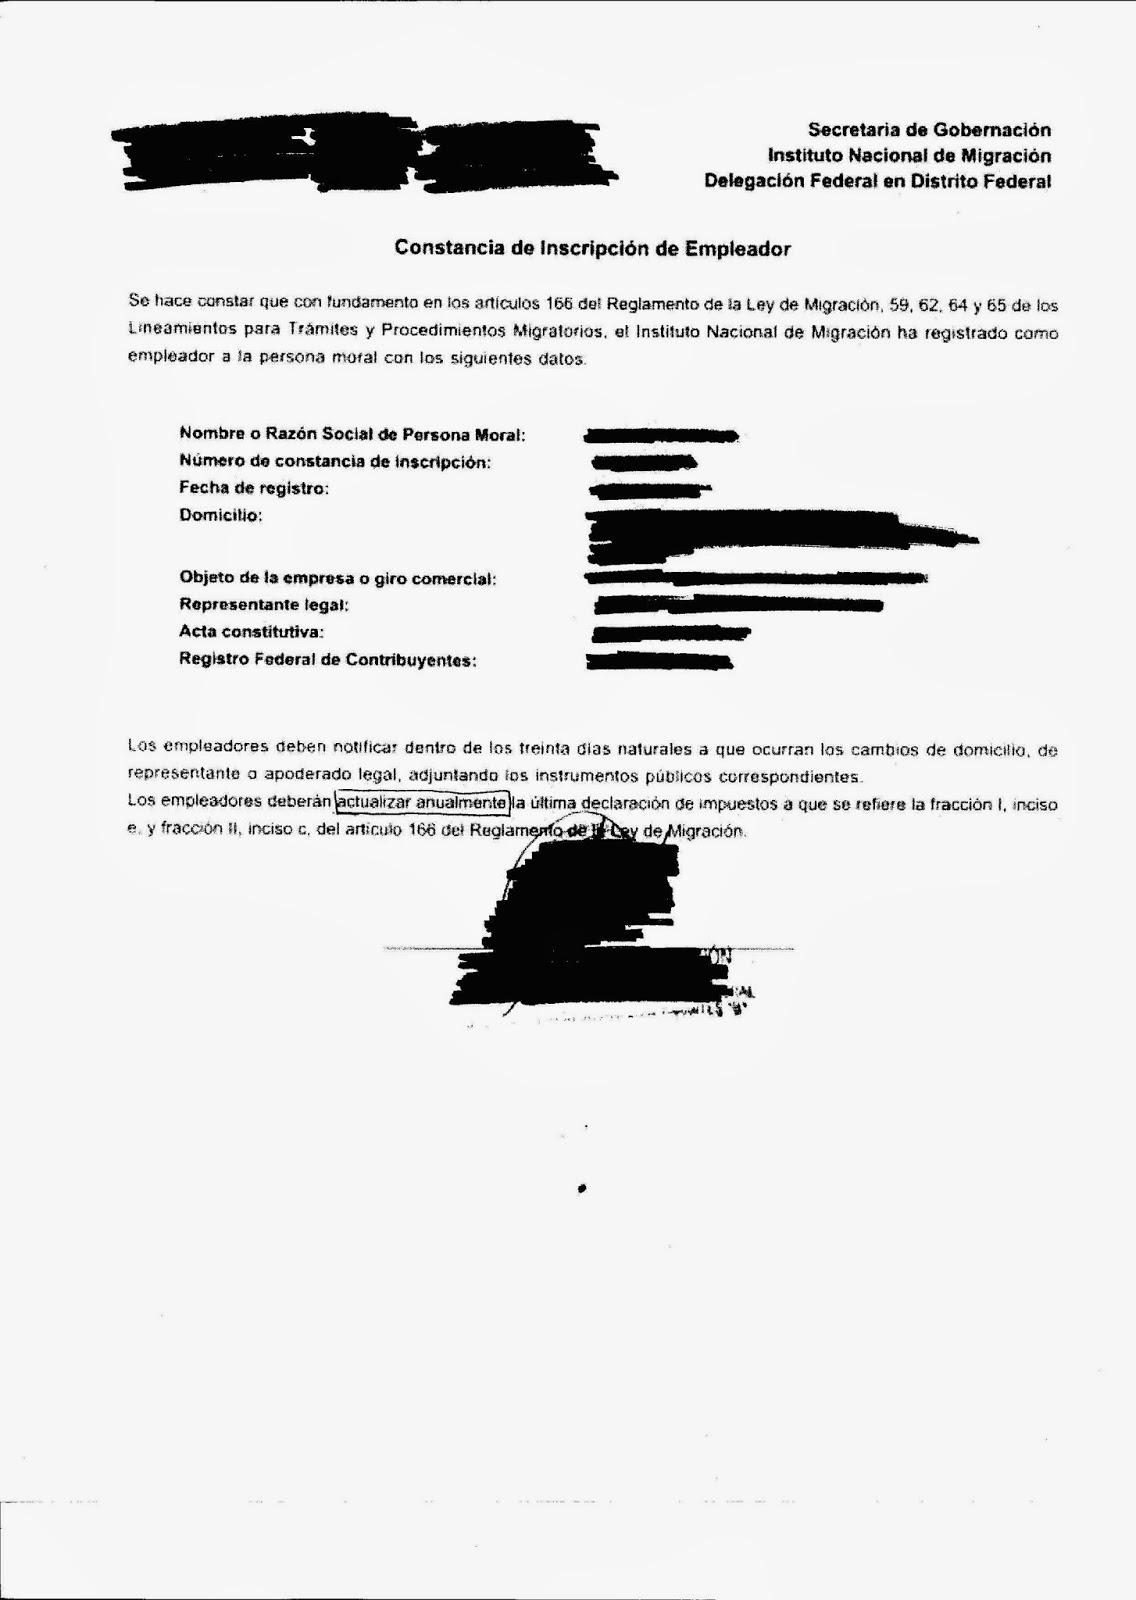 EMIGRANTES EN MÉXICO: ACTUALIZACIÓN DE CONSTANCIA DE INSCRIPCIÓN ...